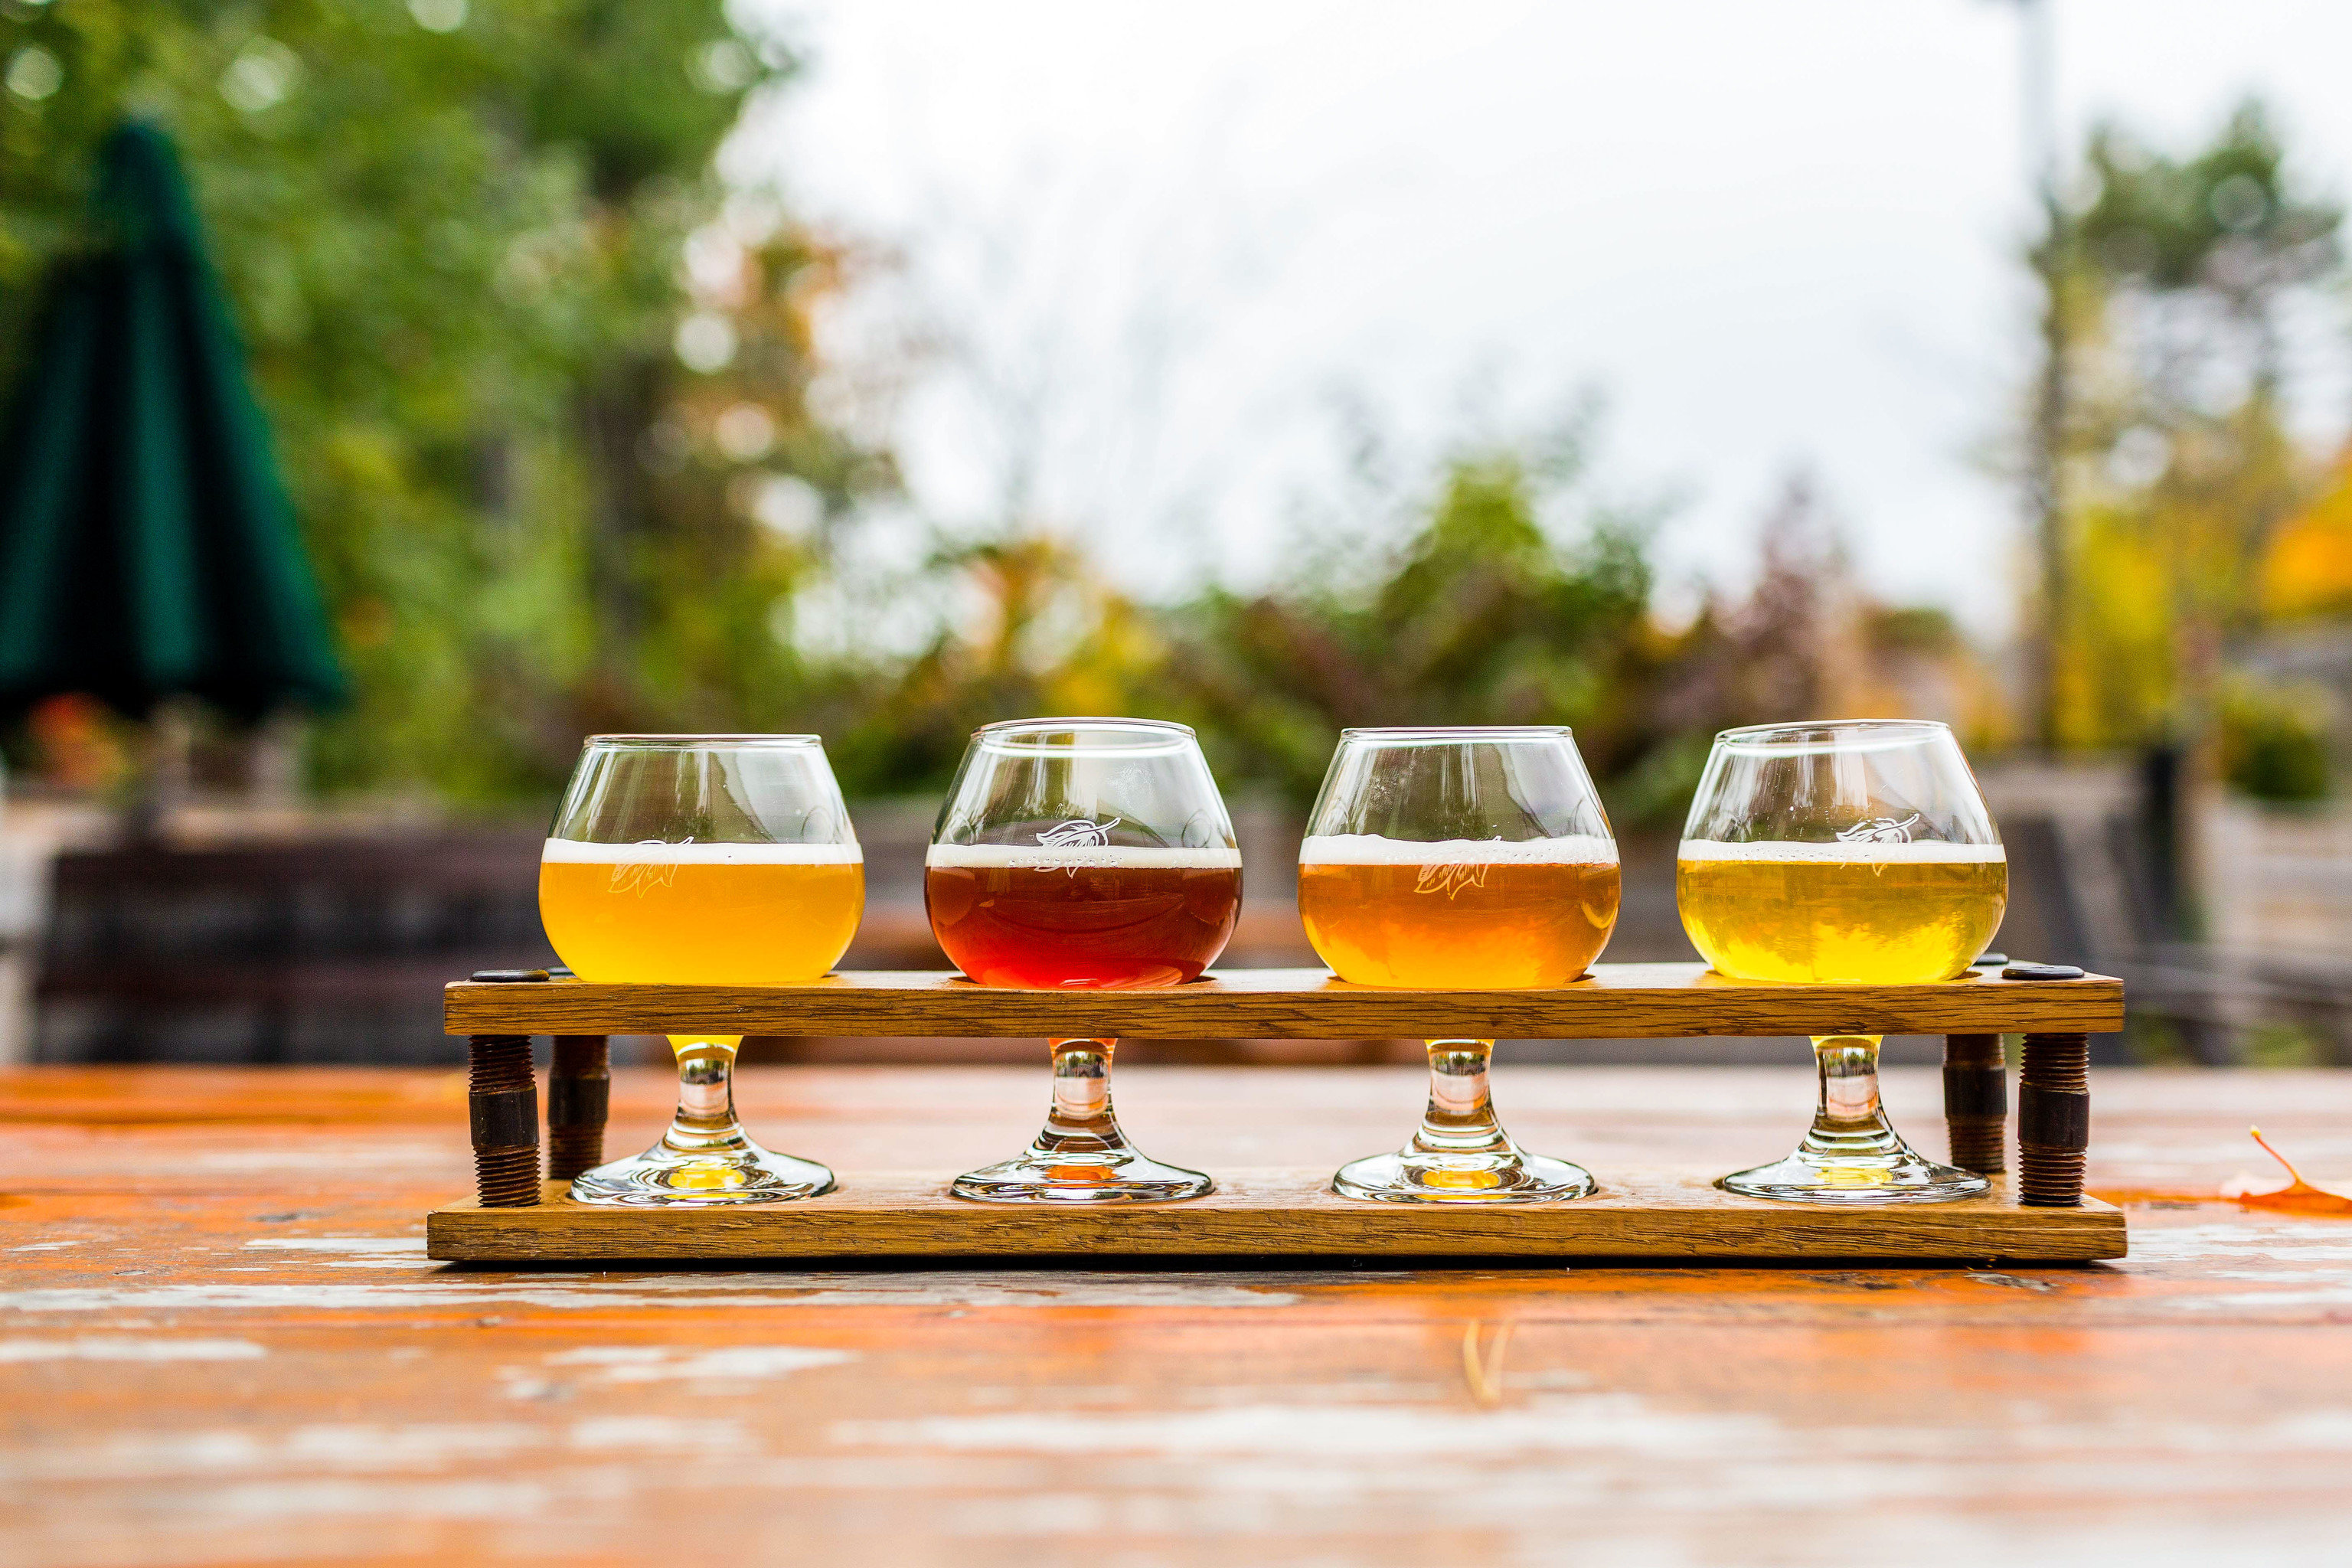 Food + Drink Trip Ideas table outdoor Drink alcoholic beverage beer glass orange